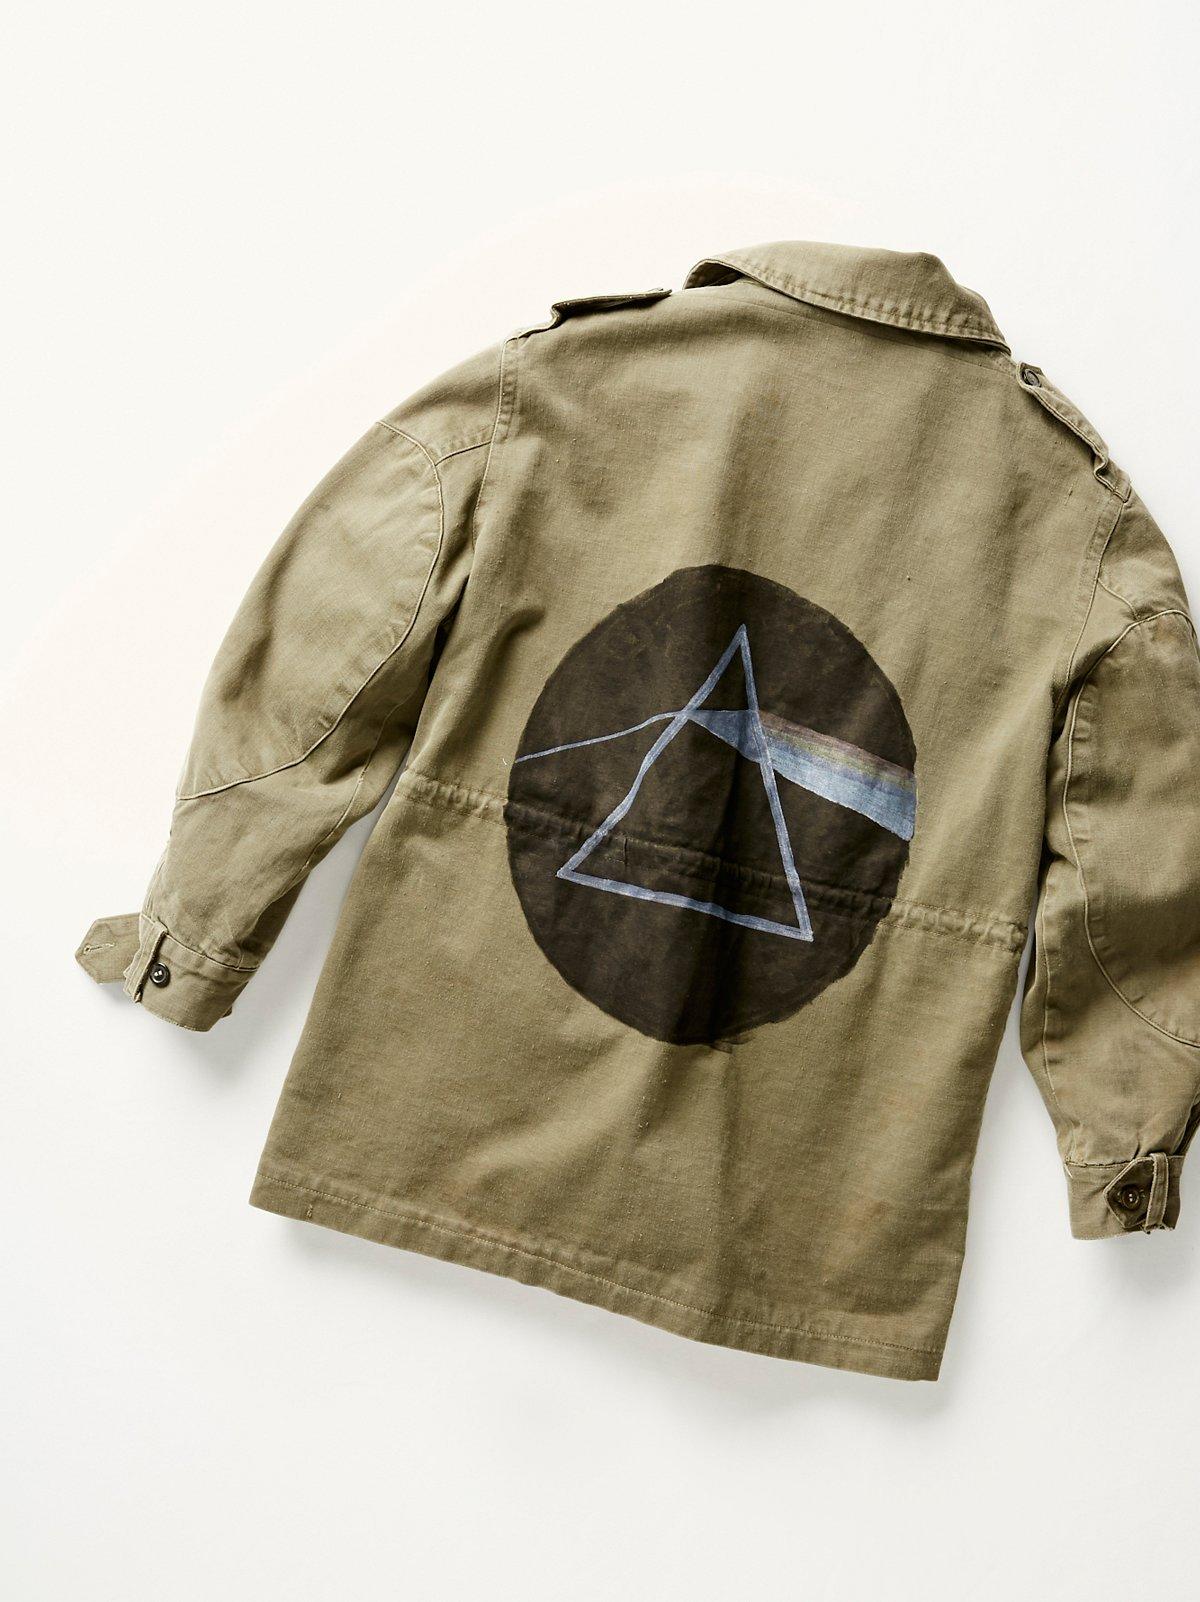 Vintage 1970s Painted Military Jacket